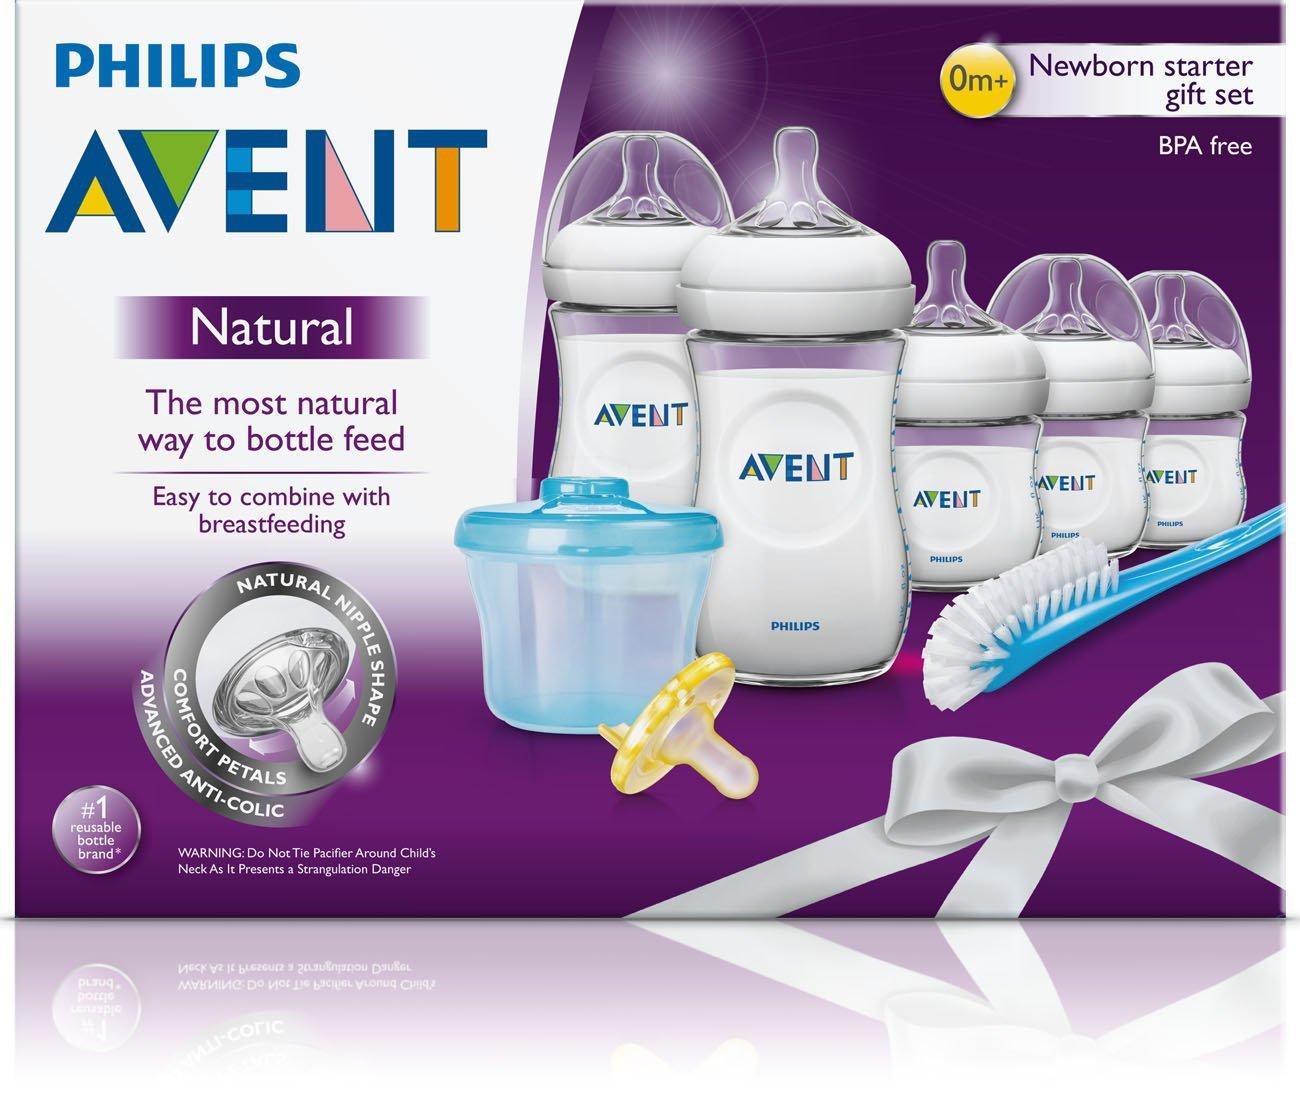 Philips Avent Natural Newborn Baby Bottle Starter Set, SCD296/02